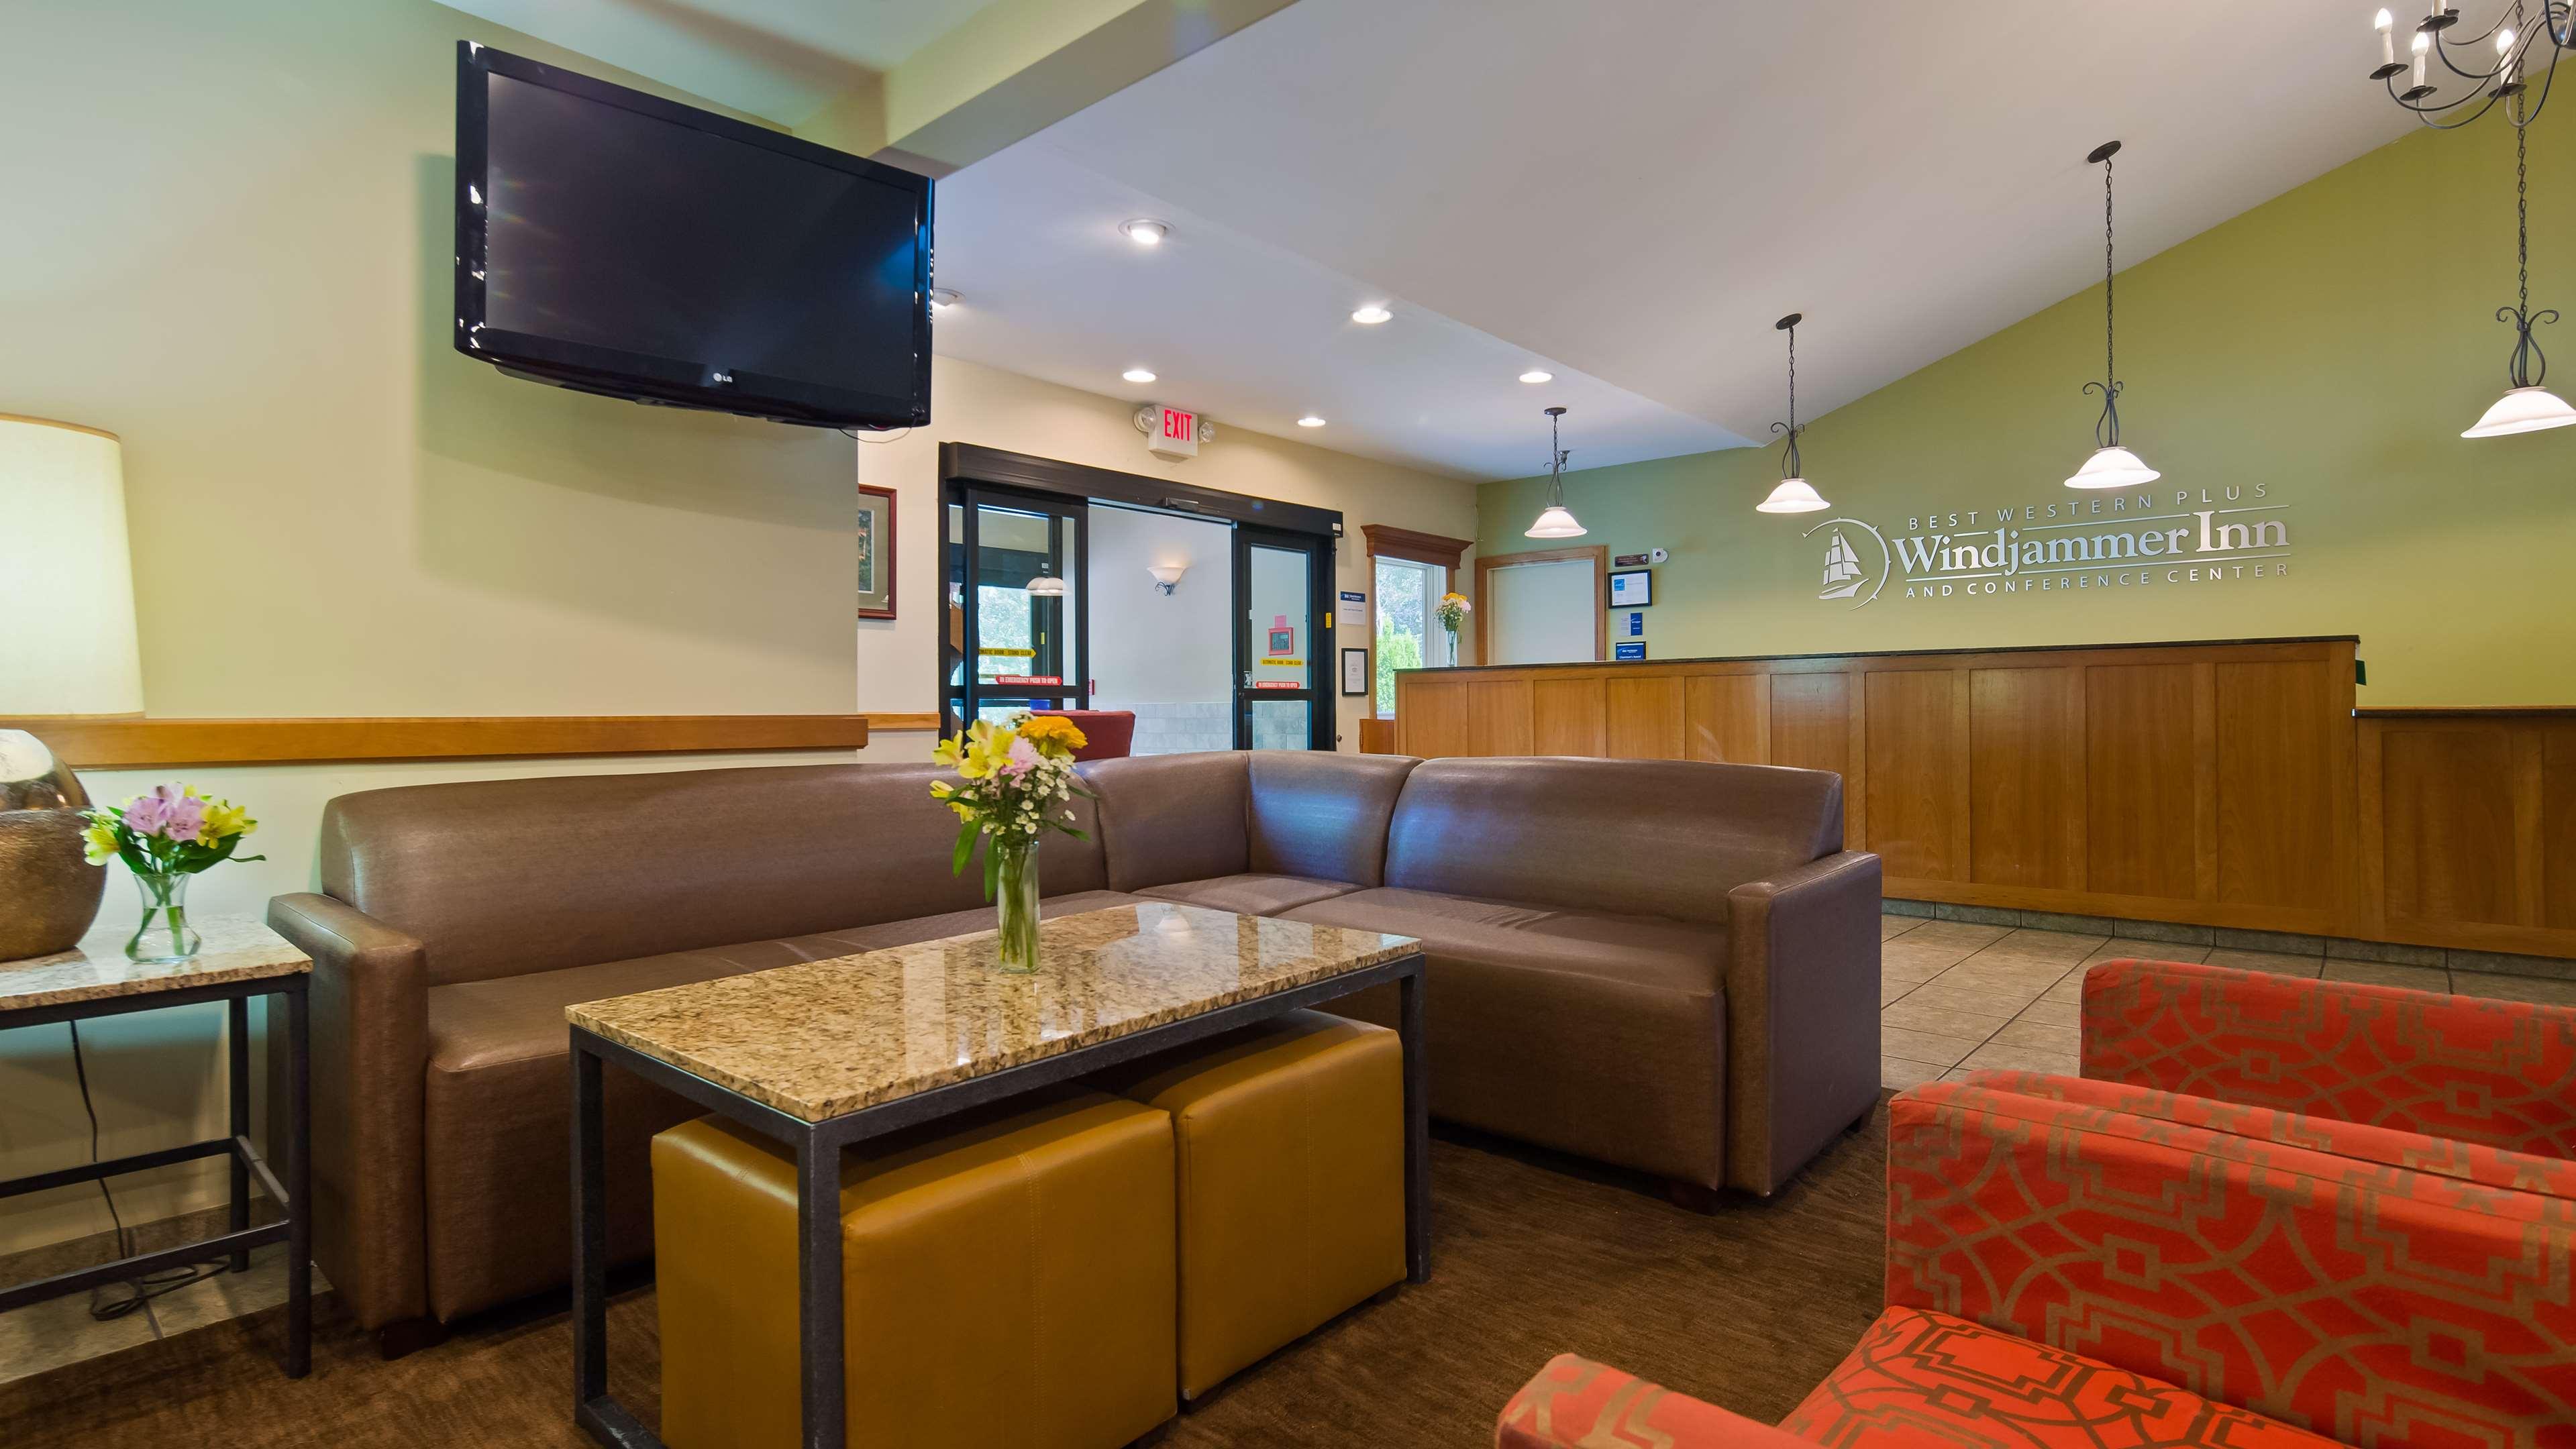 Best Western Plus Windjammer Inn & Conference Center image 1